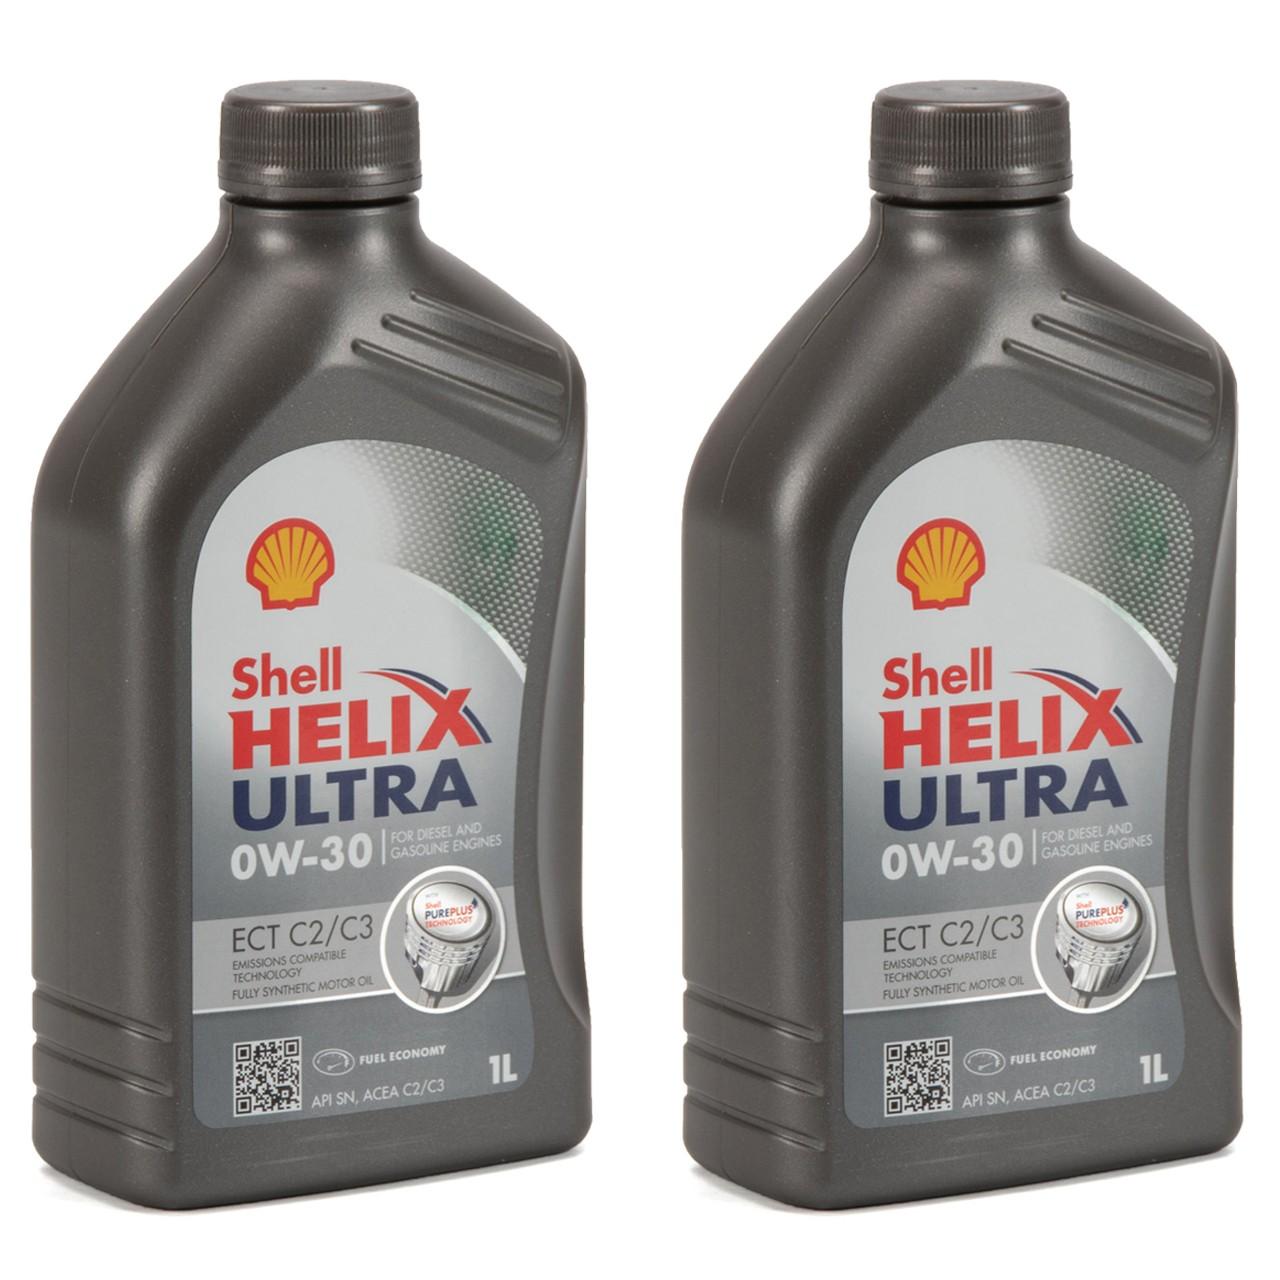 SHELL Motoröl Öl HELIX ULTRA ECT C2/C3 0W30 VW 50400/50700 MB 229.52 - 2 Liter